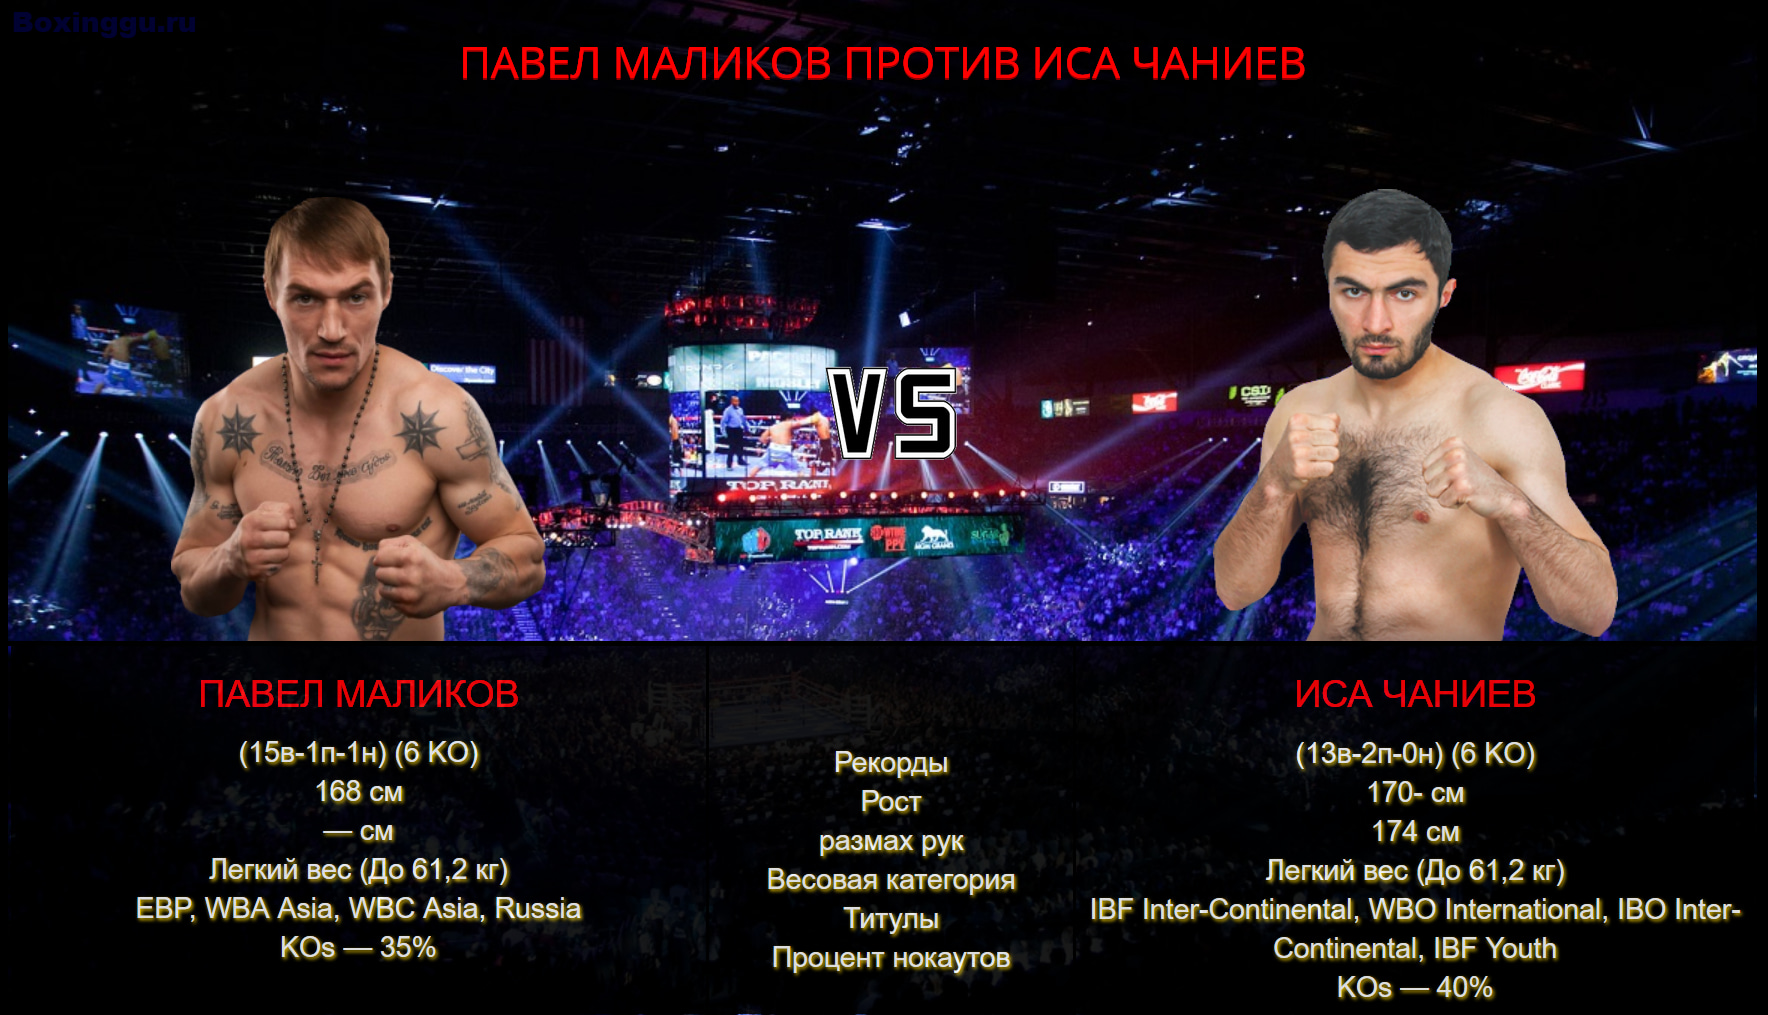 Афиша: Бой Павел Маликов - Иса Чаниев / Pavel Malikov vs Isa Chaniev